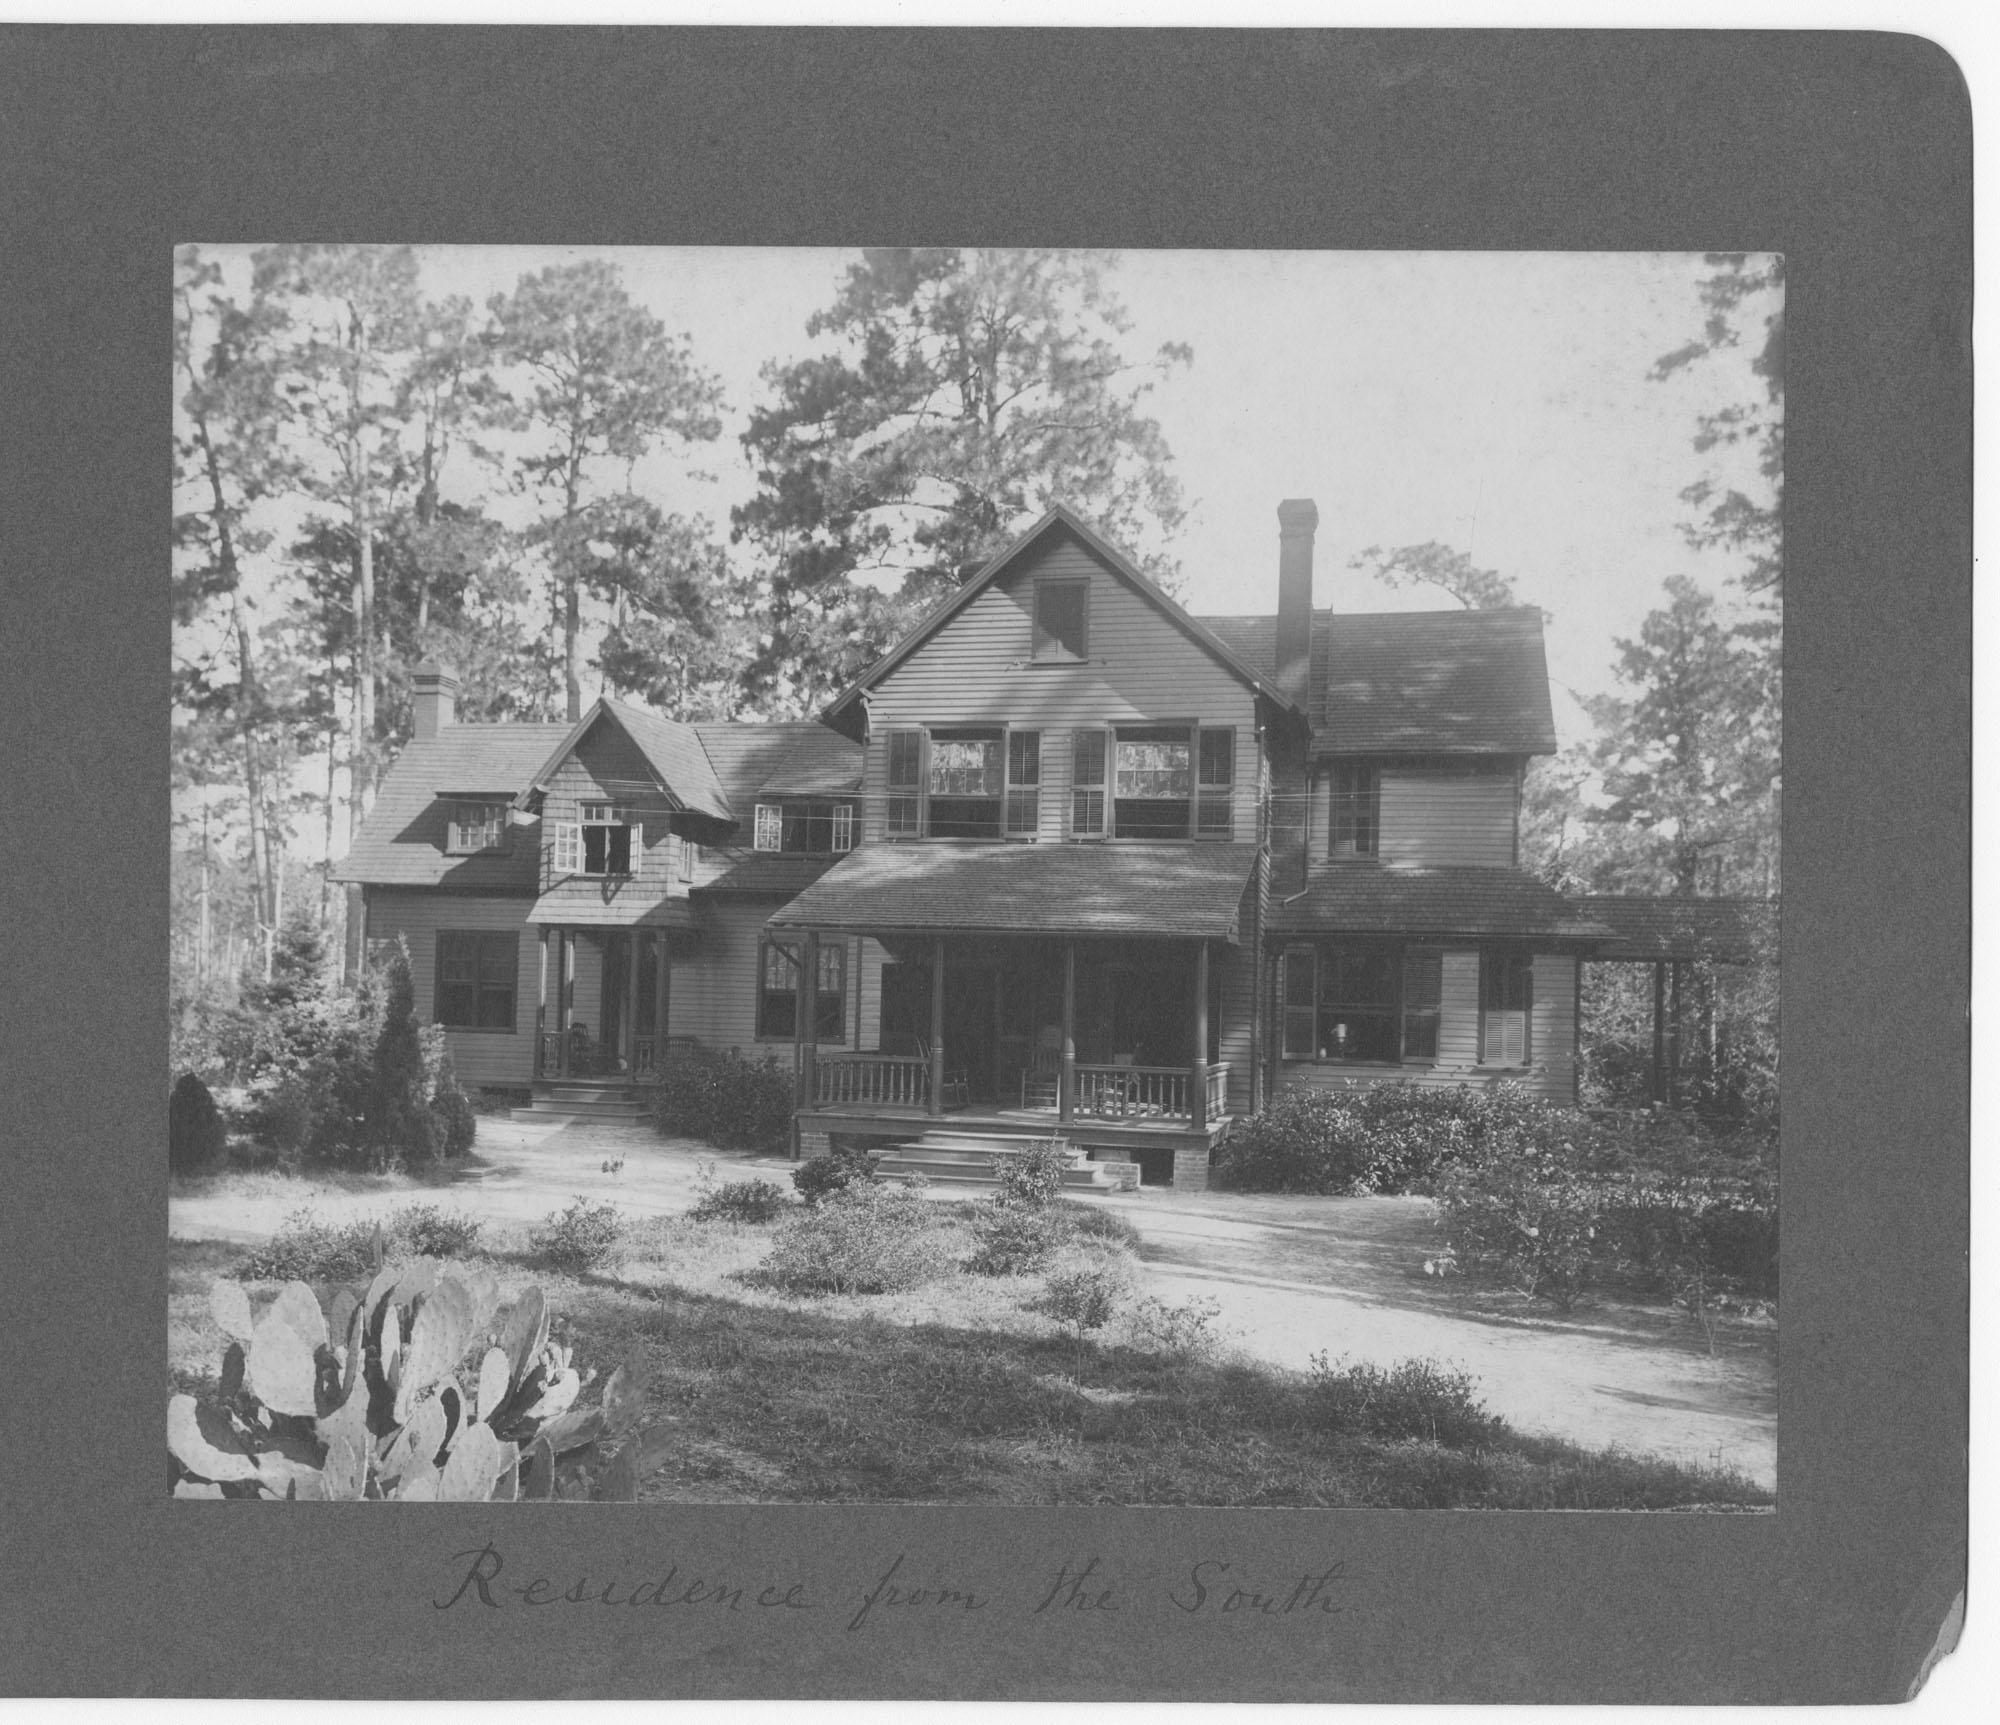 Pinehurst Tea Plantation Photograph Album, page 5